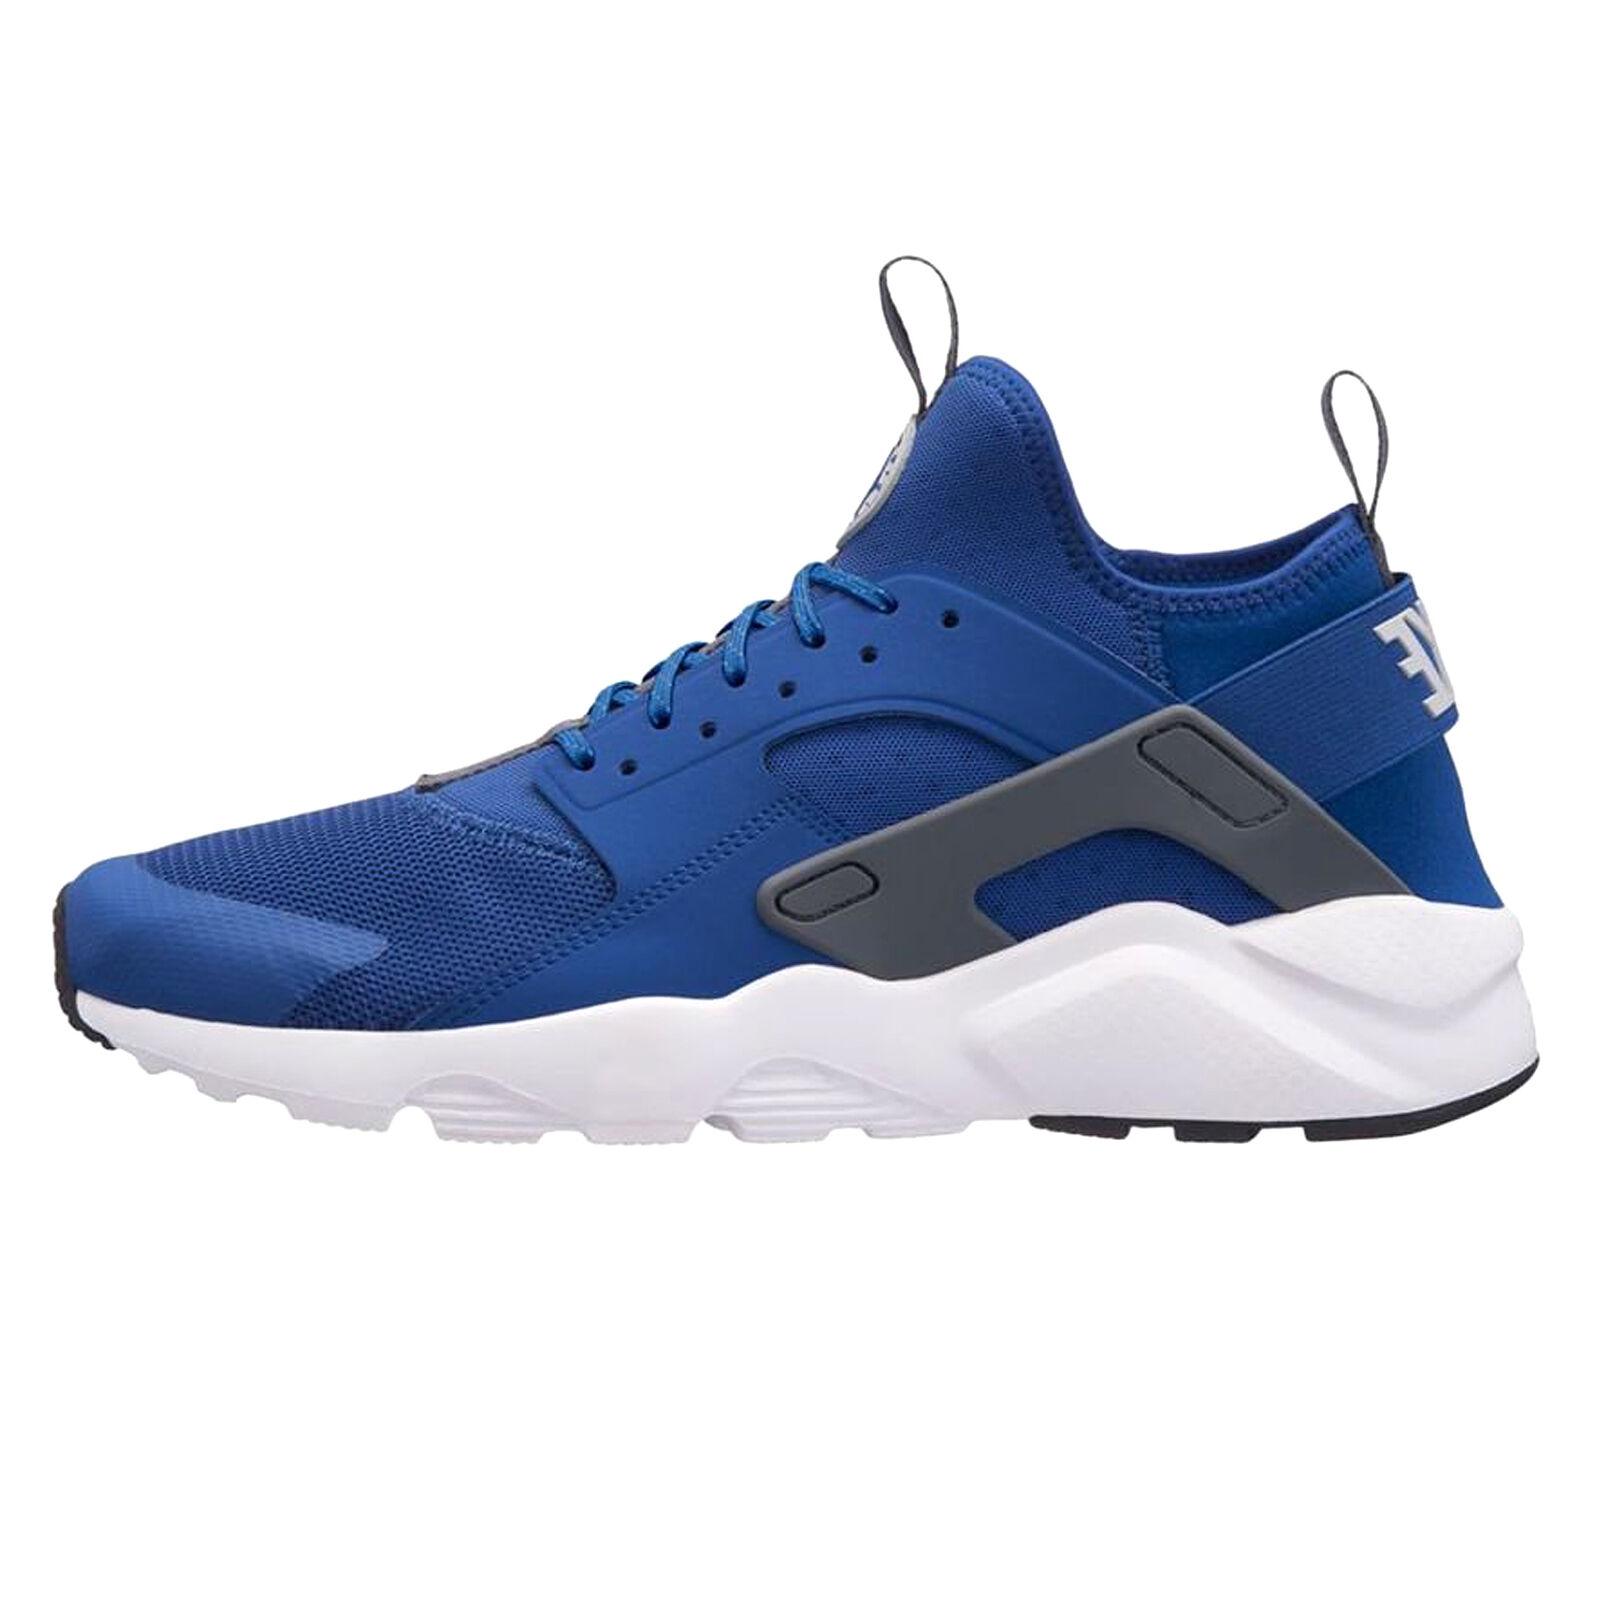 Nike AIr Huarache Sport courir Rn Ultra 819685-411 Laufschuh Sport Huarache Sneaker Freizeitschuh 964a4b